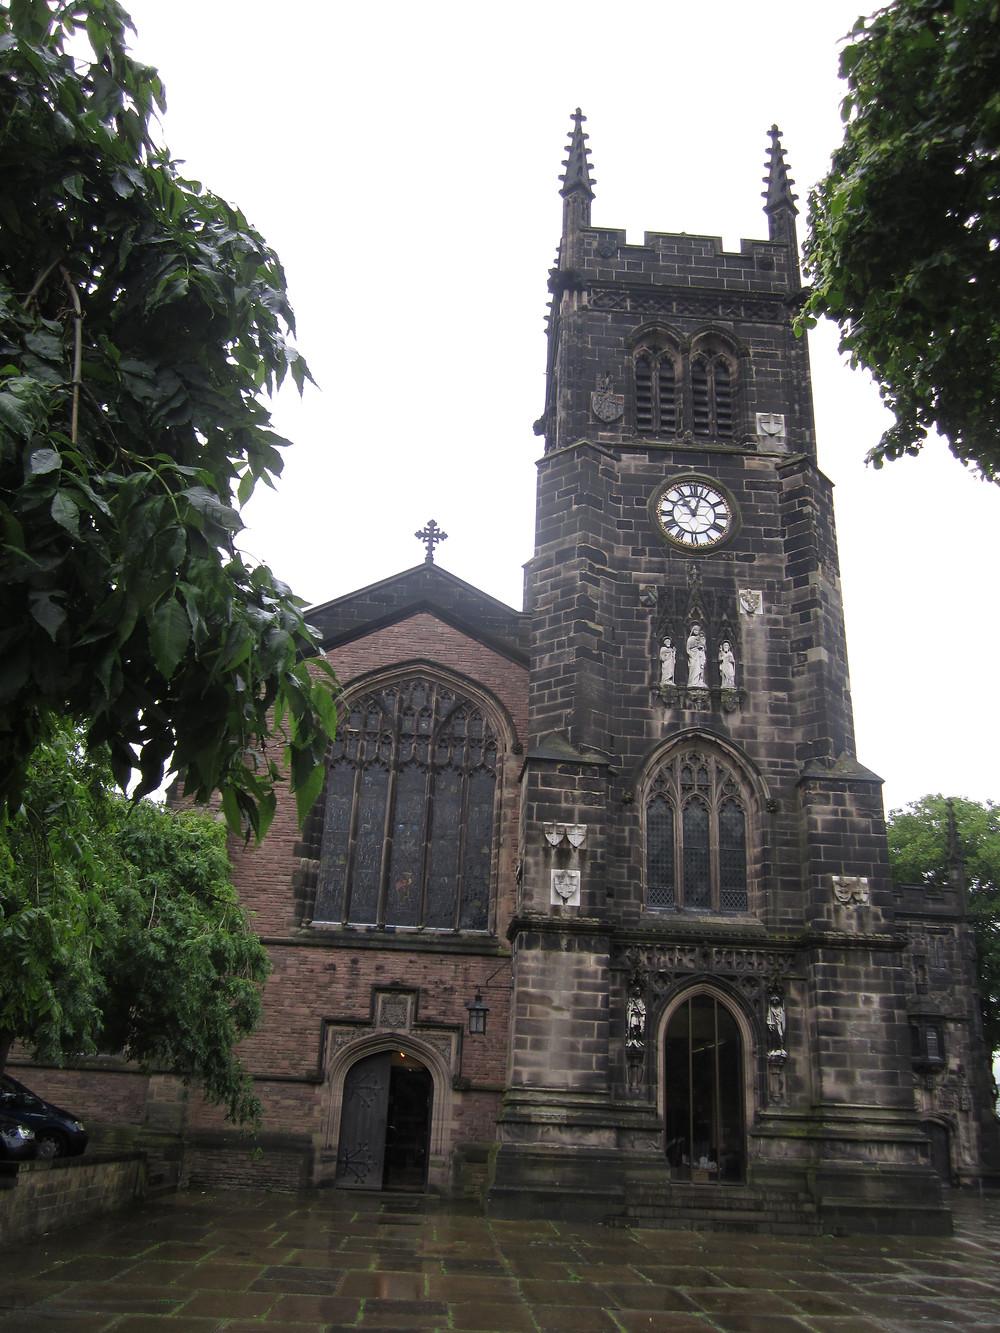 St_Michael_and_All_Angels_Church,_Macclesfield_(3).JPG